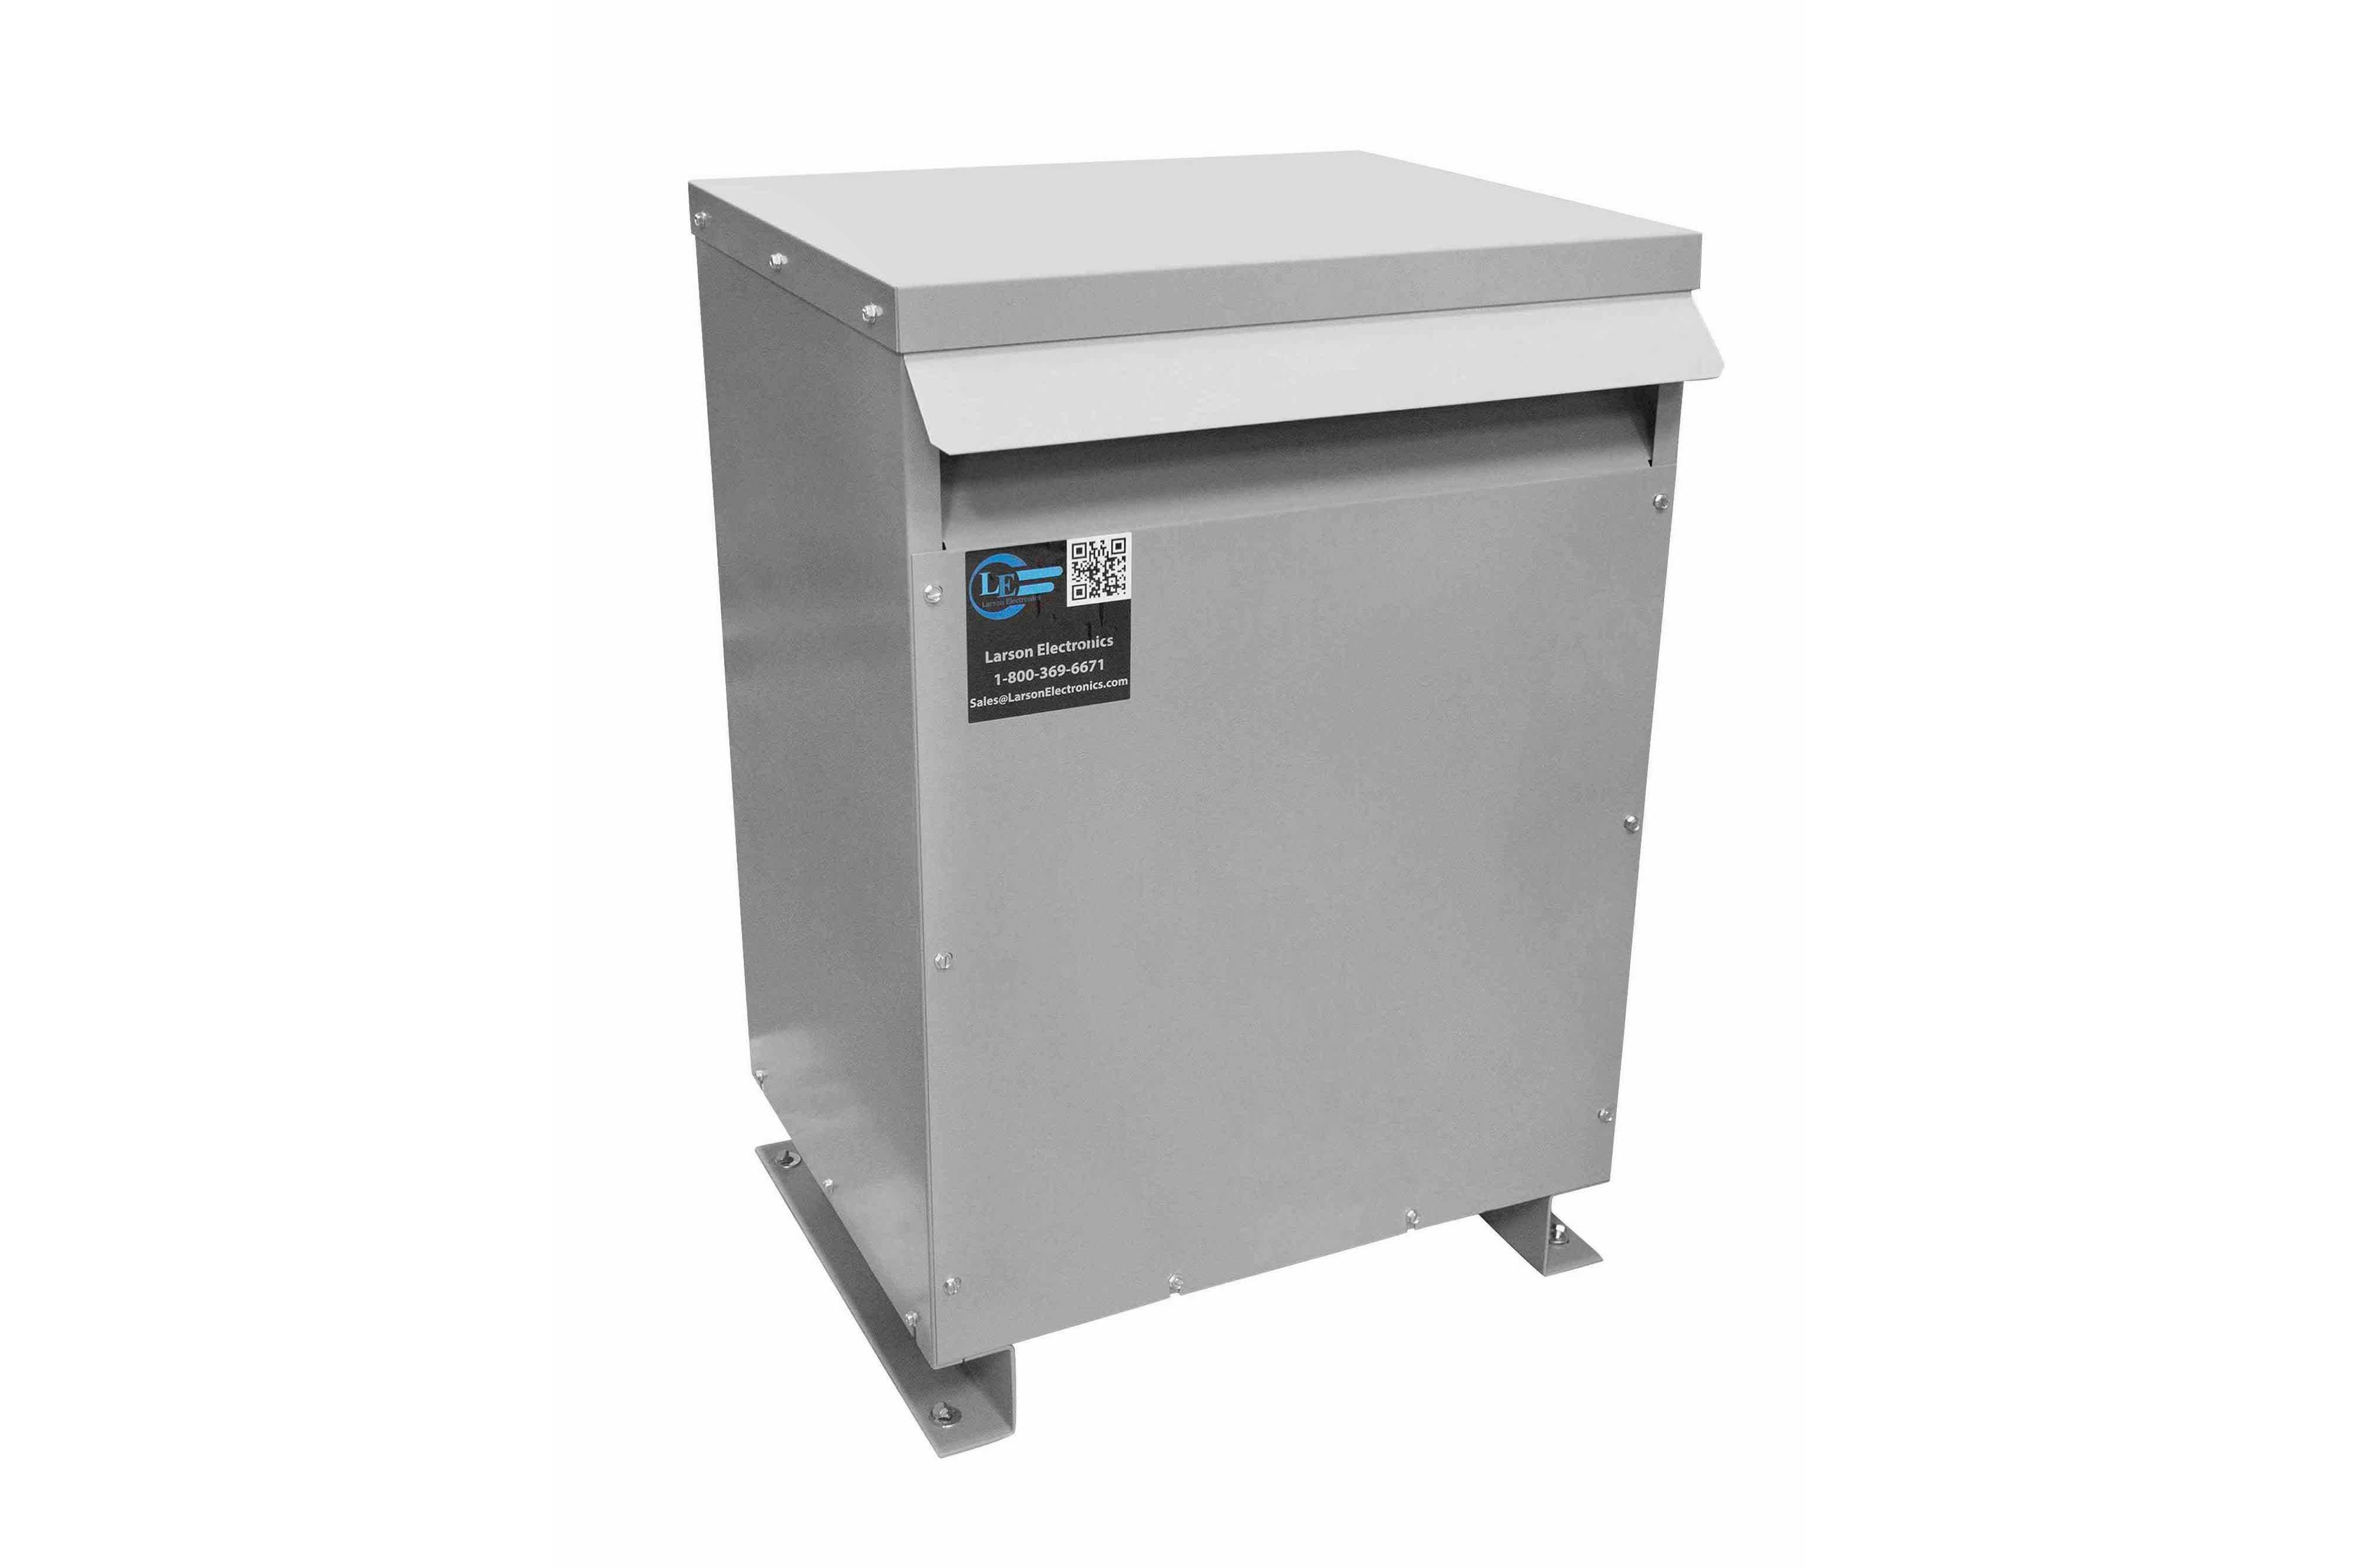 200 kVA 3PH Isolation Transformer, 208V Wye Primary, 240V/120 Delta Secondary, N3R, Ventilated, 60 Hz